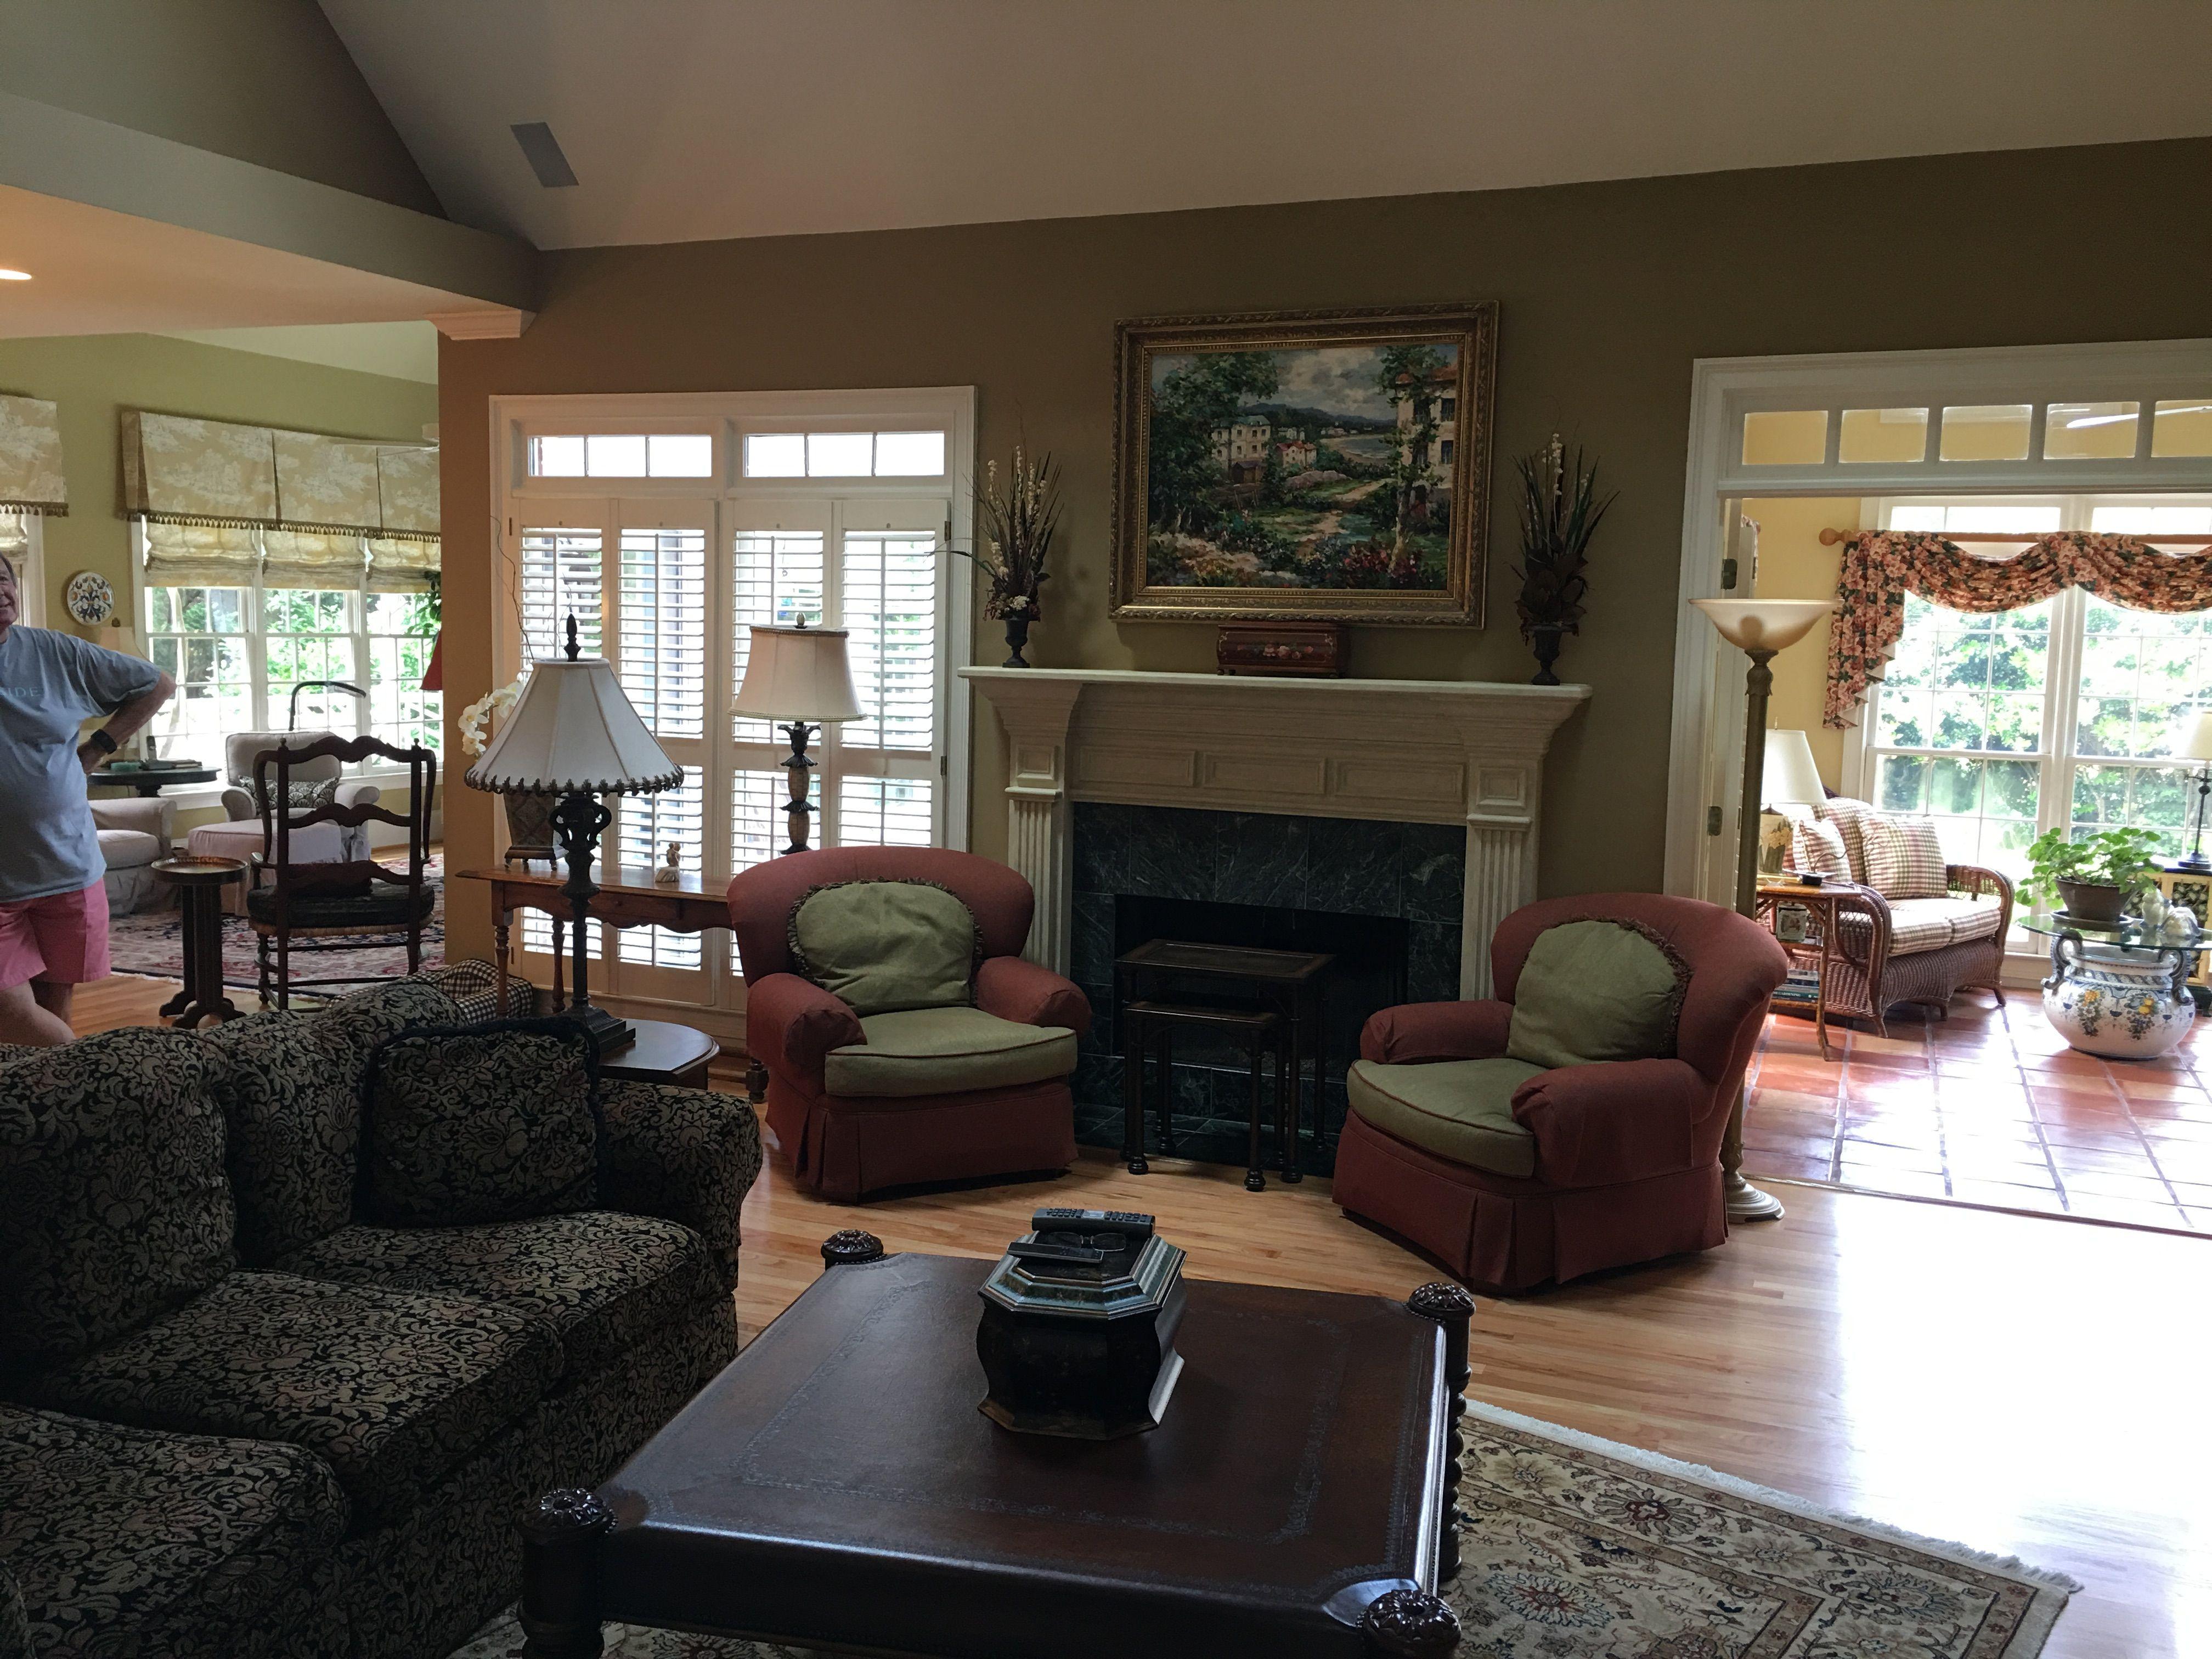 Pin by Daniel Norris on Den | Living room furniture, Best ...